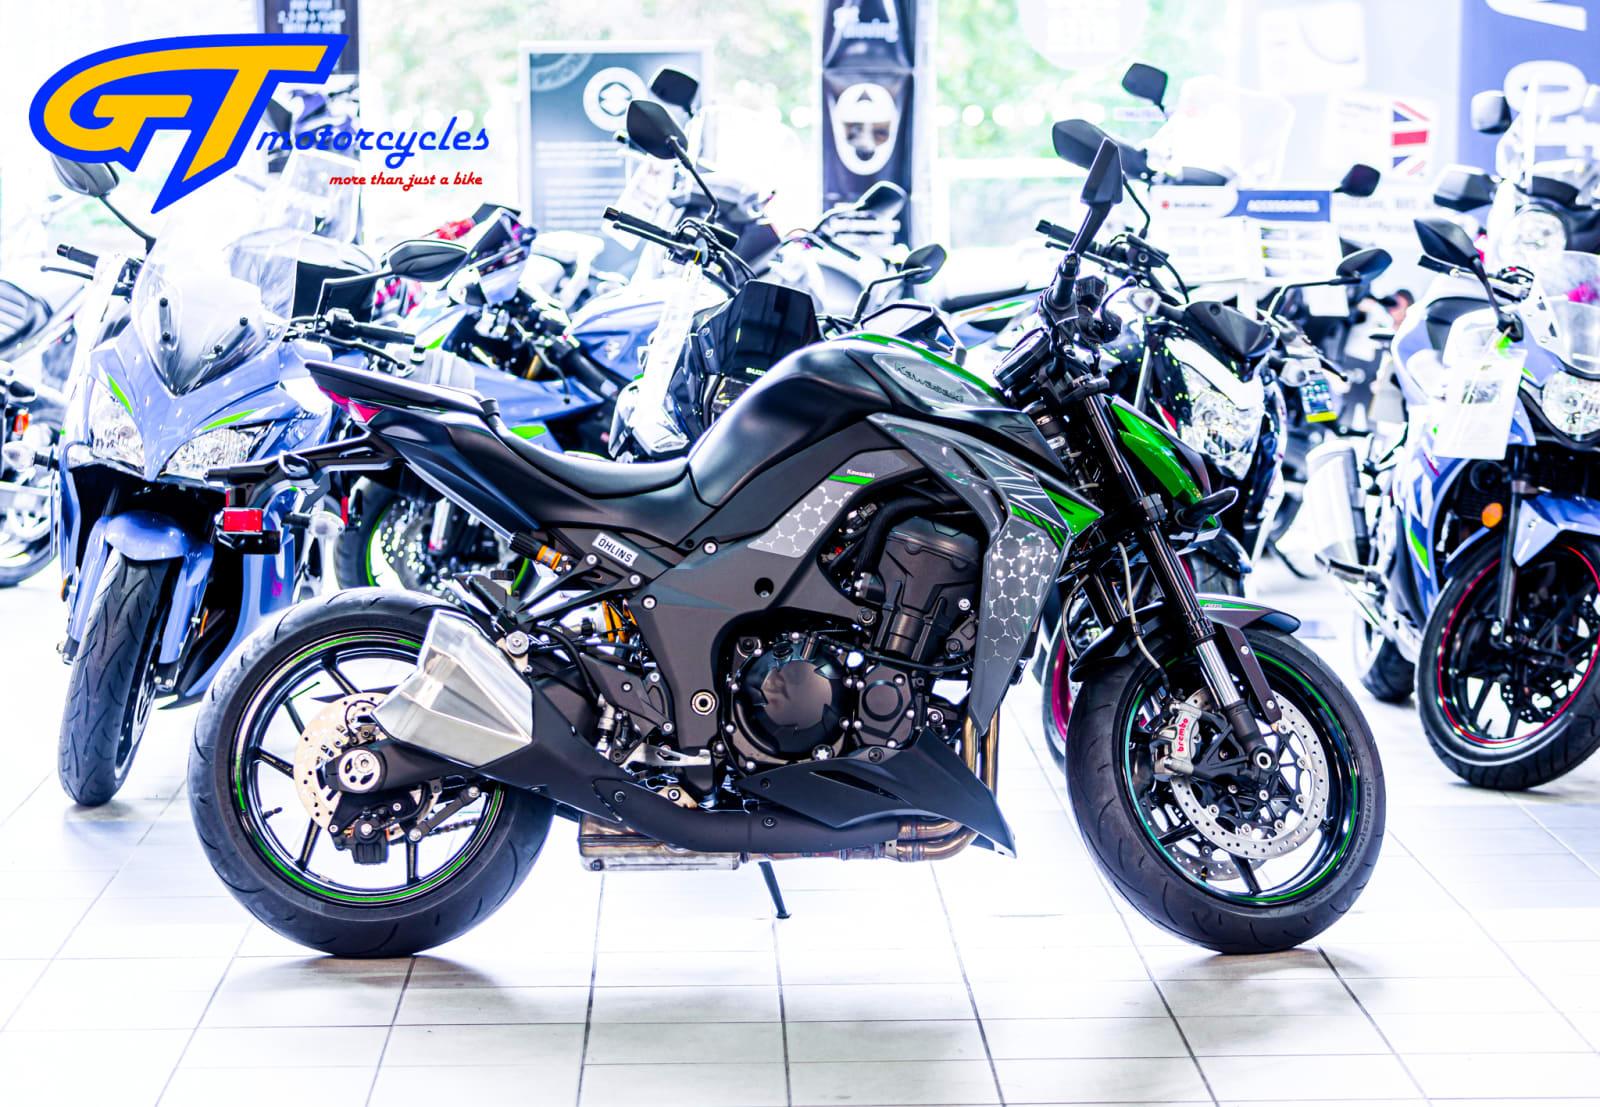 picture of a Kawasaki Z1000R